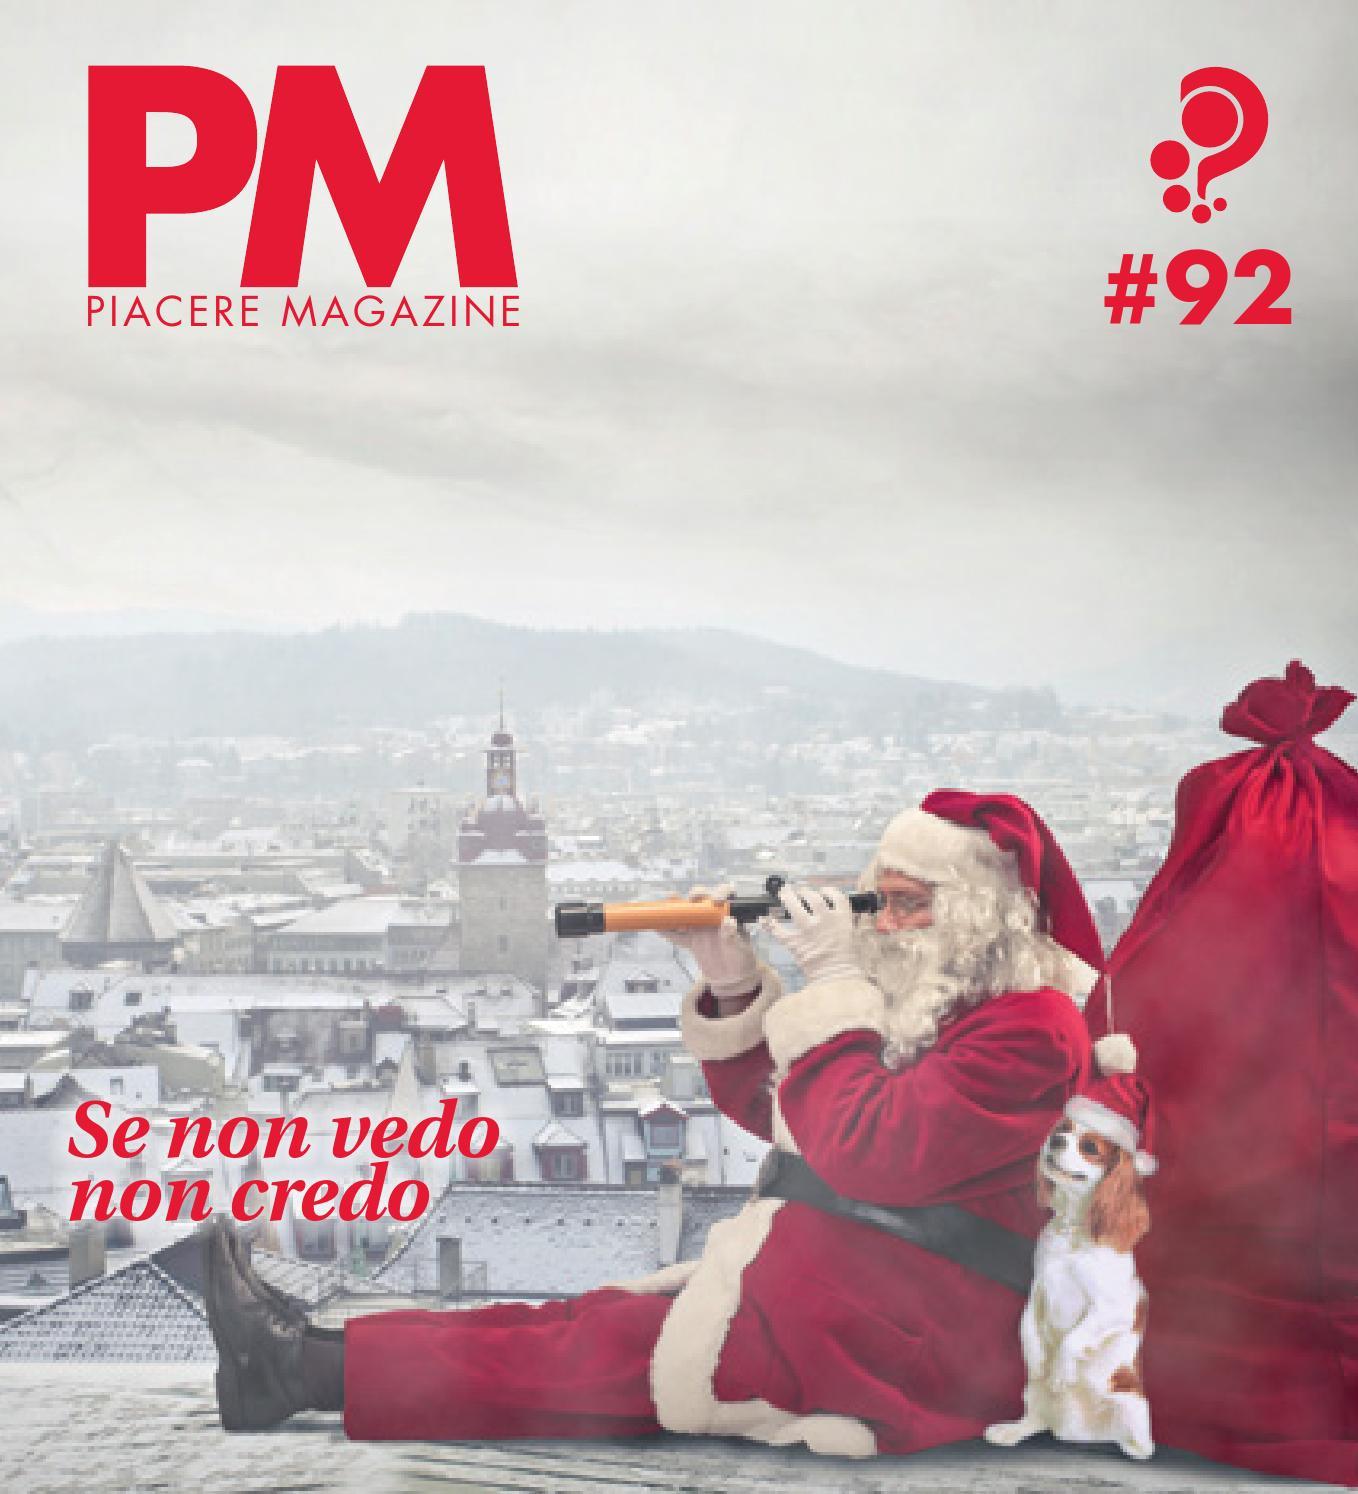 Piacere Magazine n.92 Dicembre 2014 Gennaio 2015 by PM